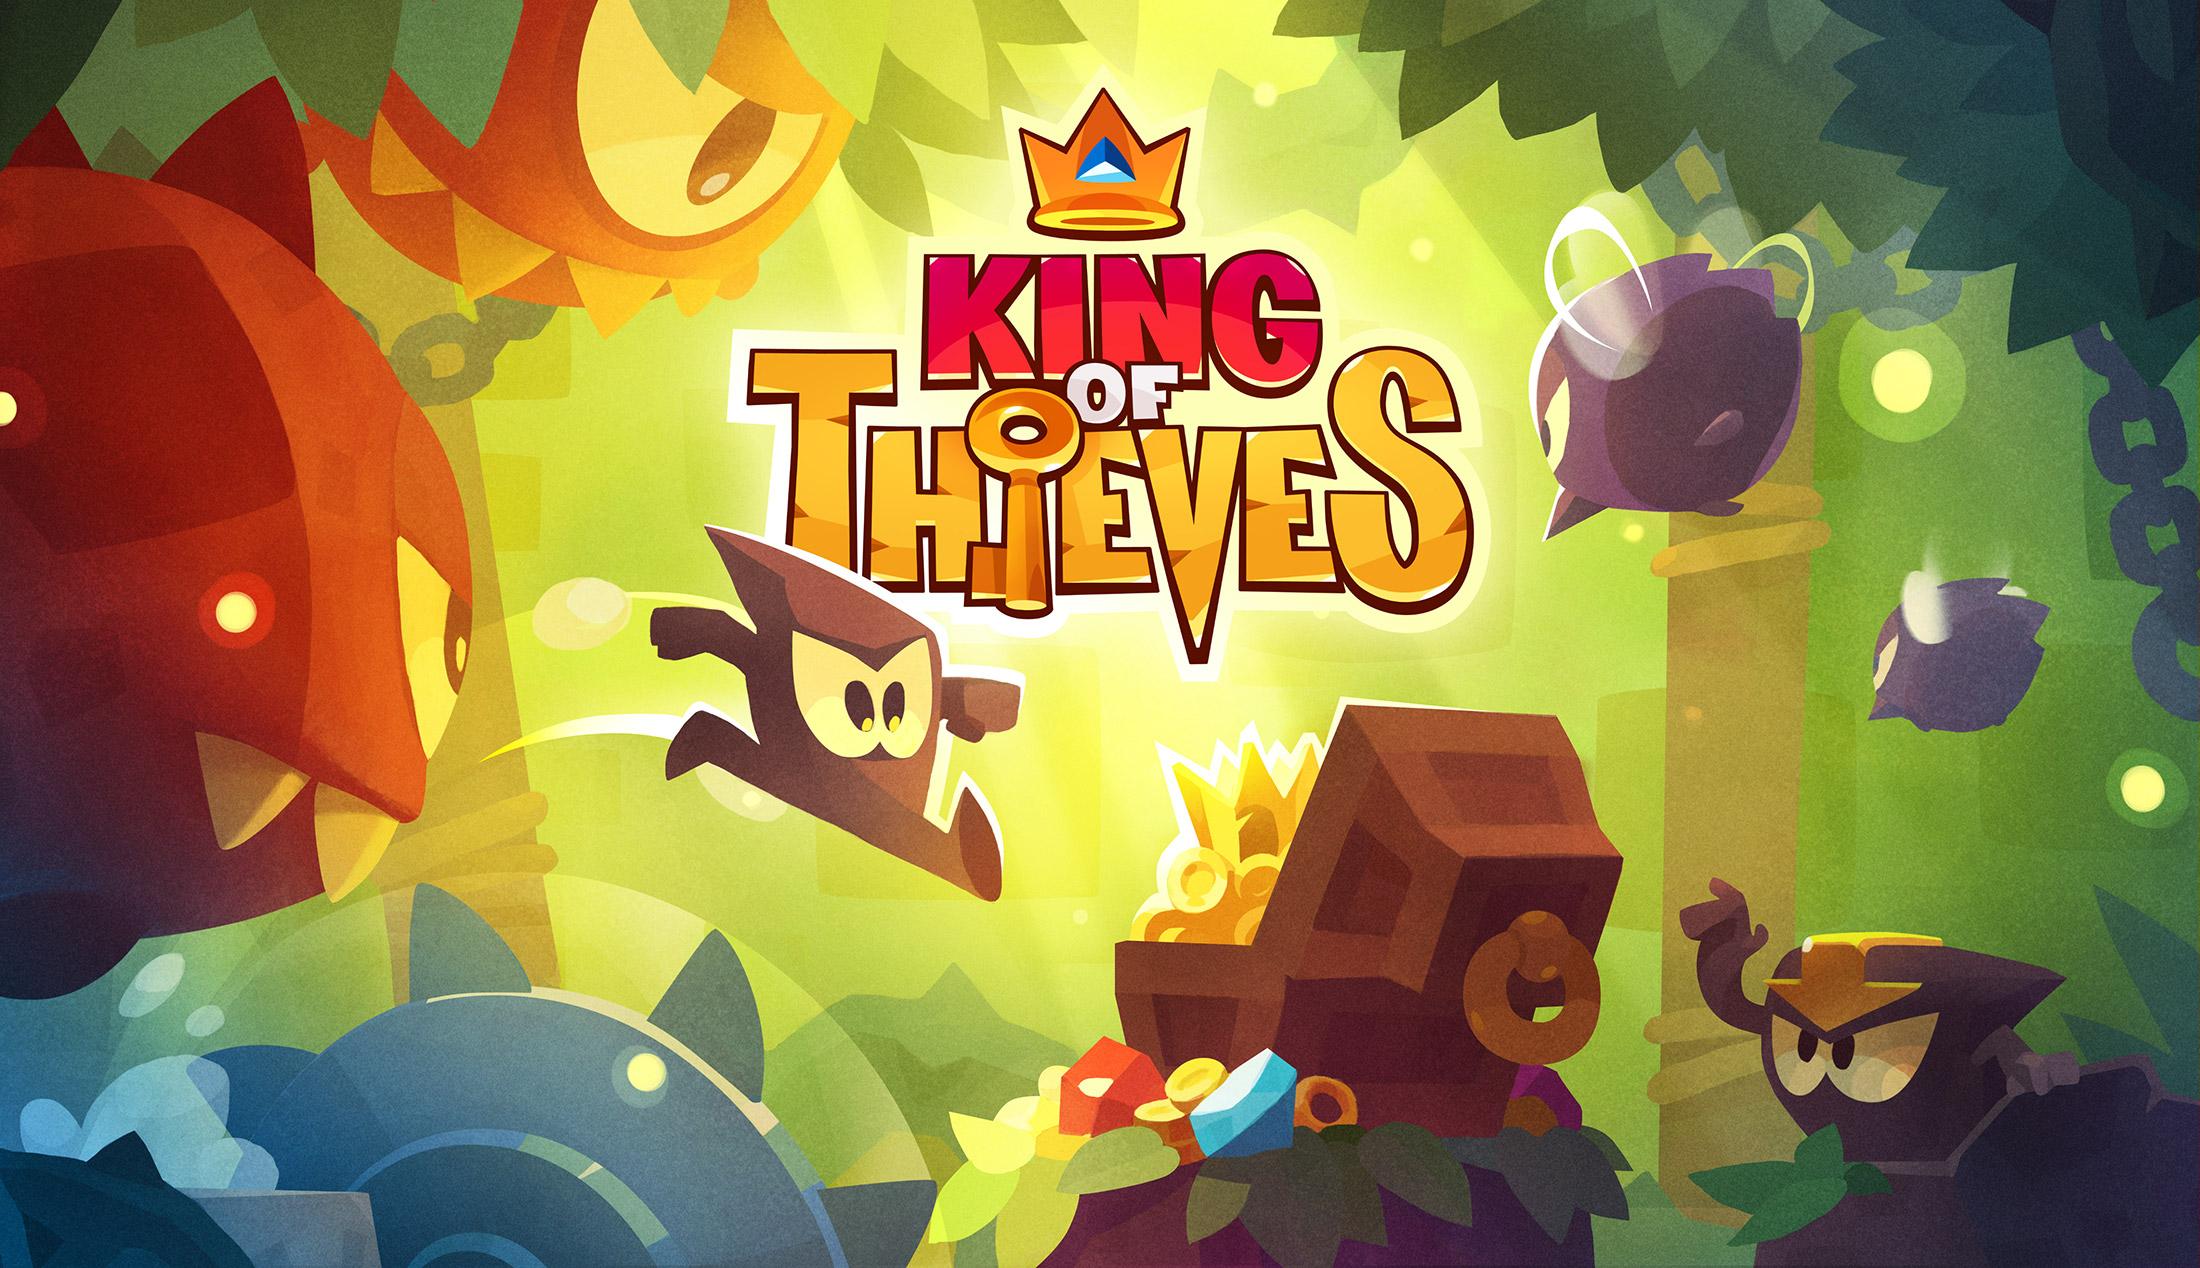 KingofThieves_promoart